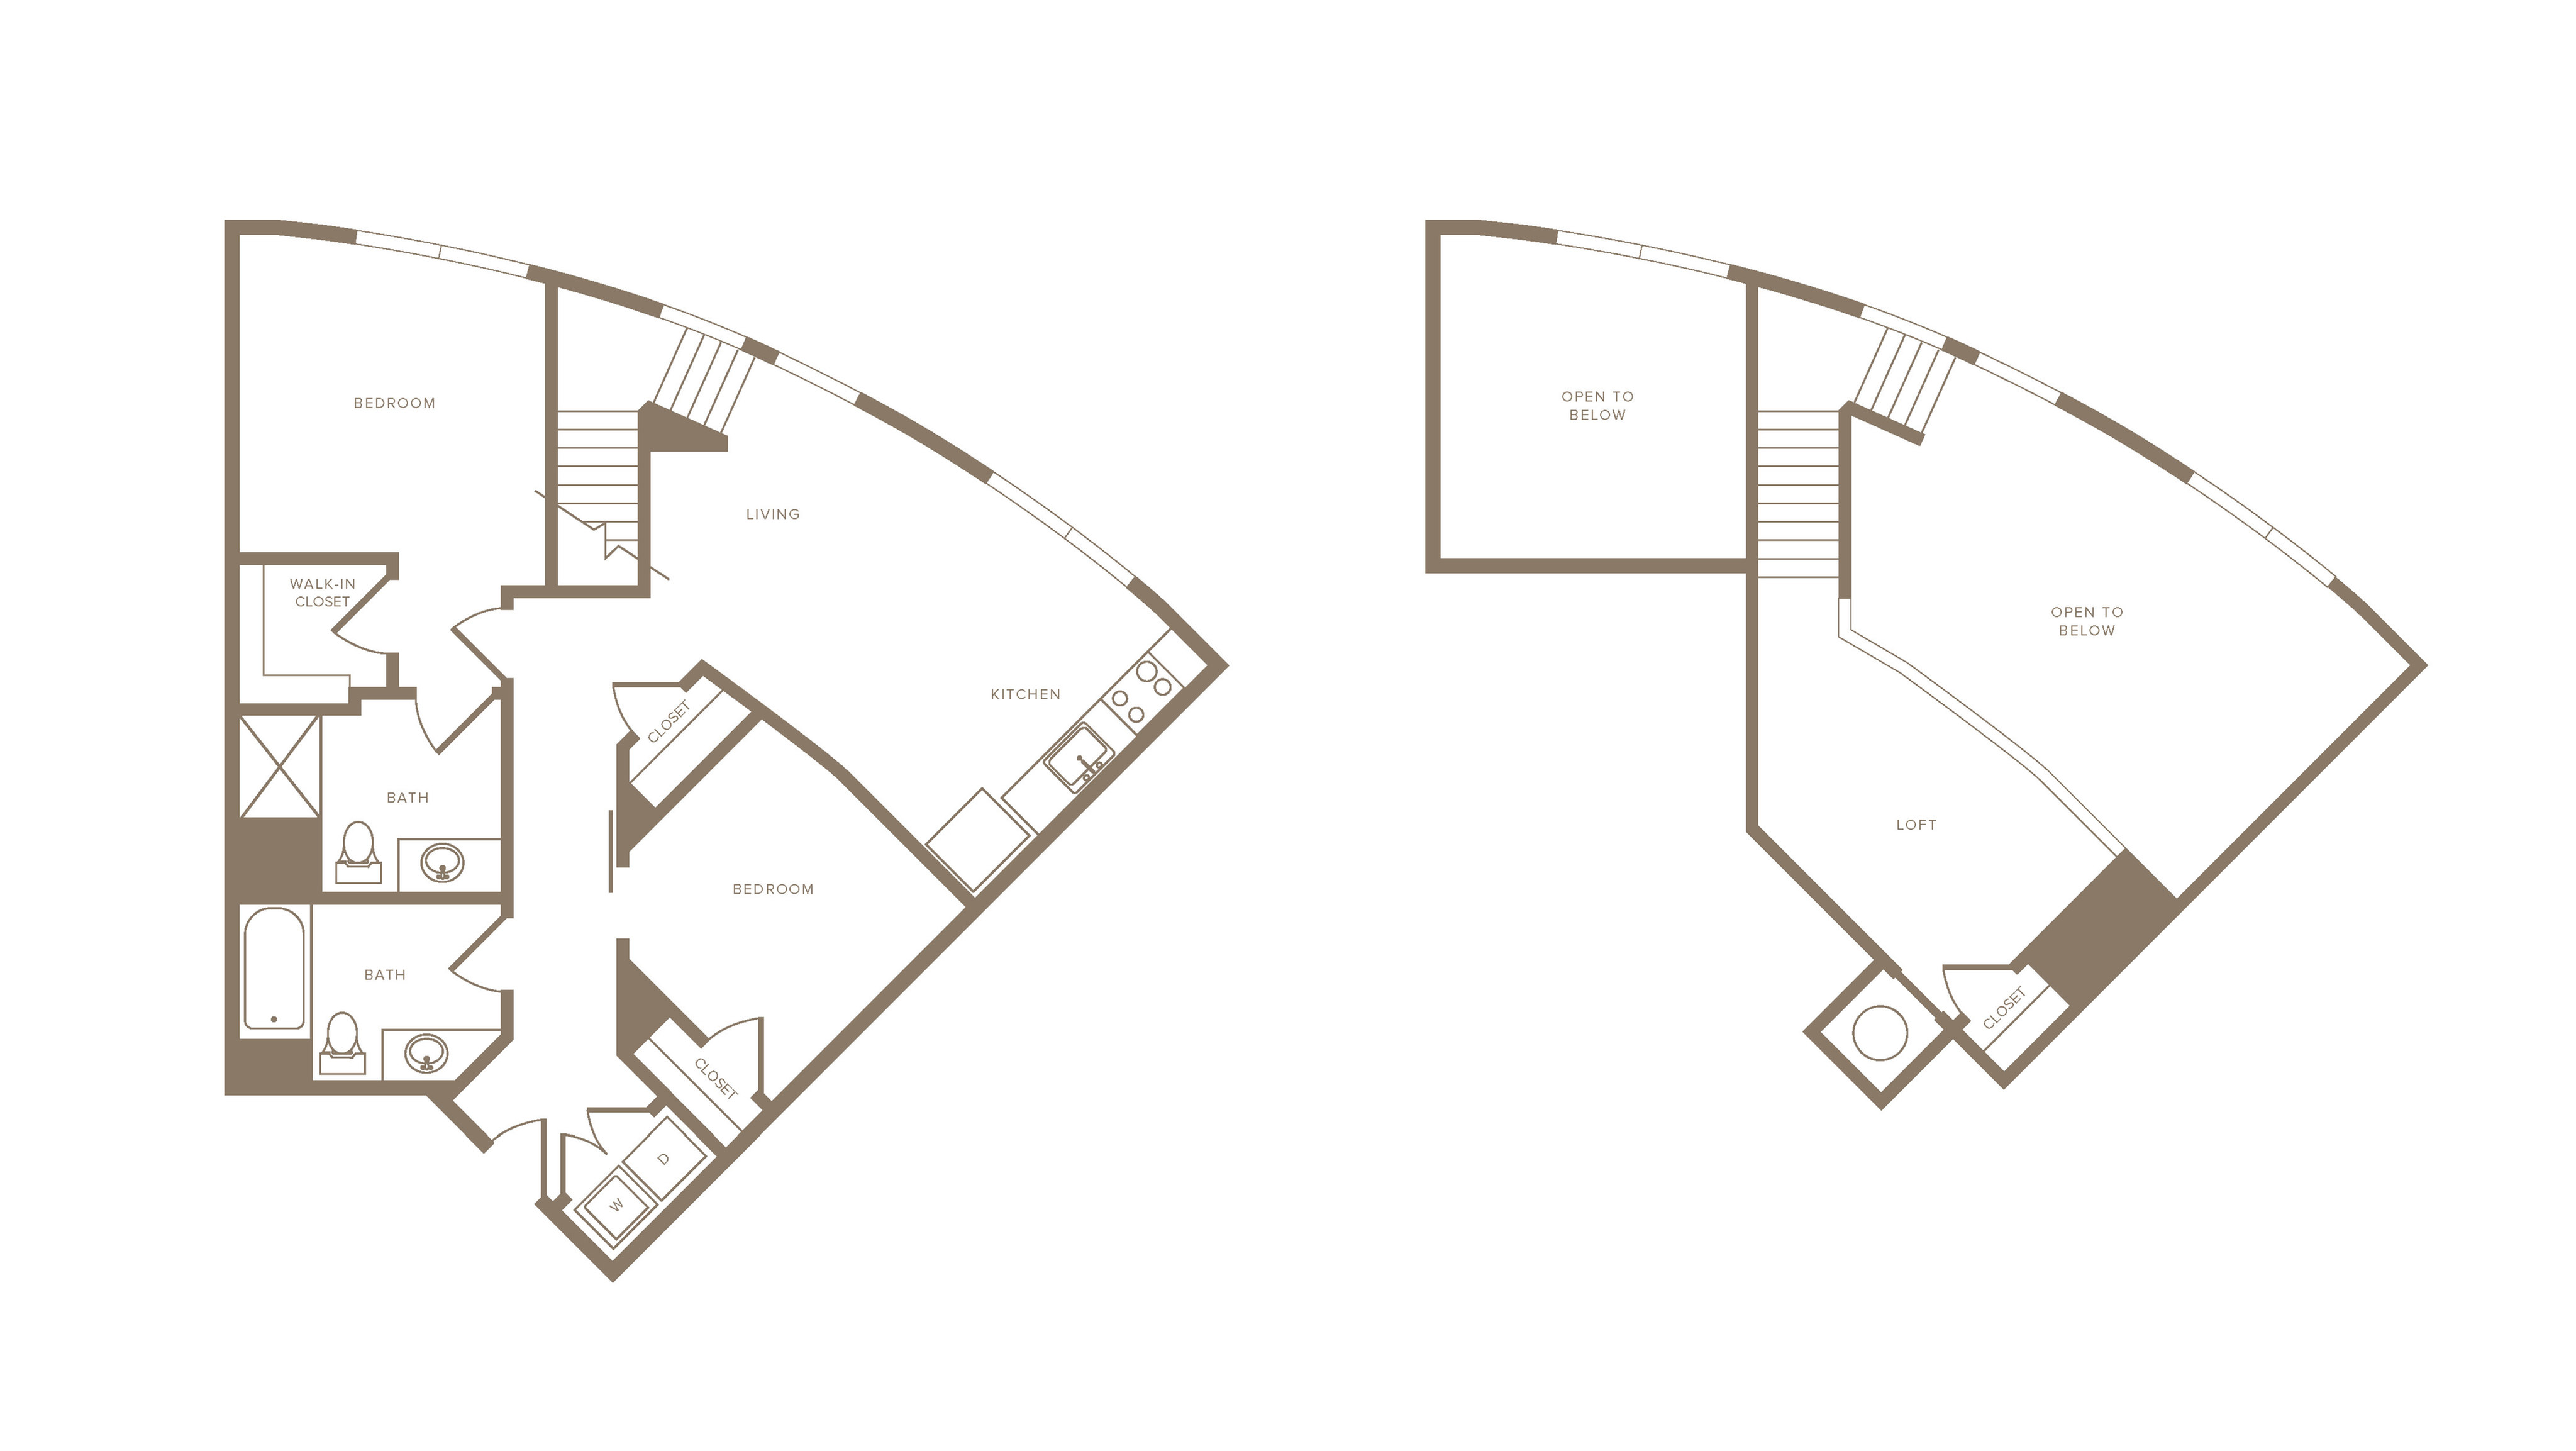 1143 square foot two bedroom two bath loft apartment floorplan image